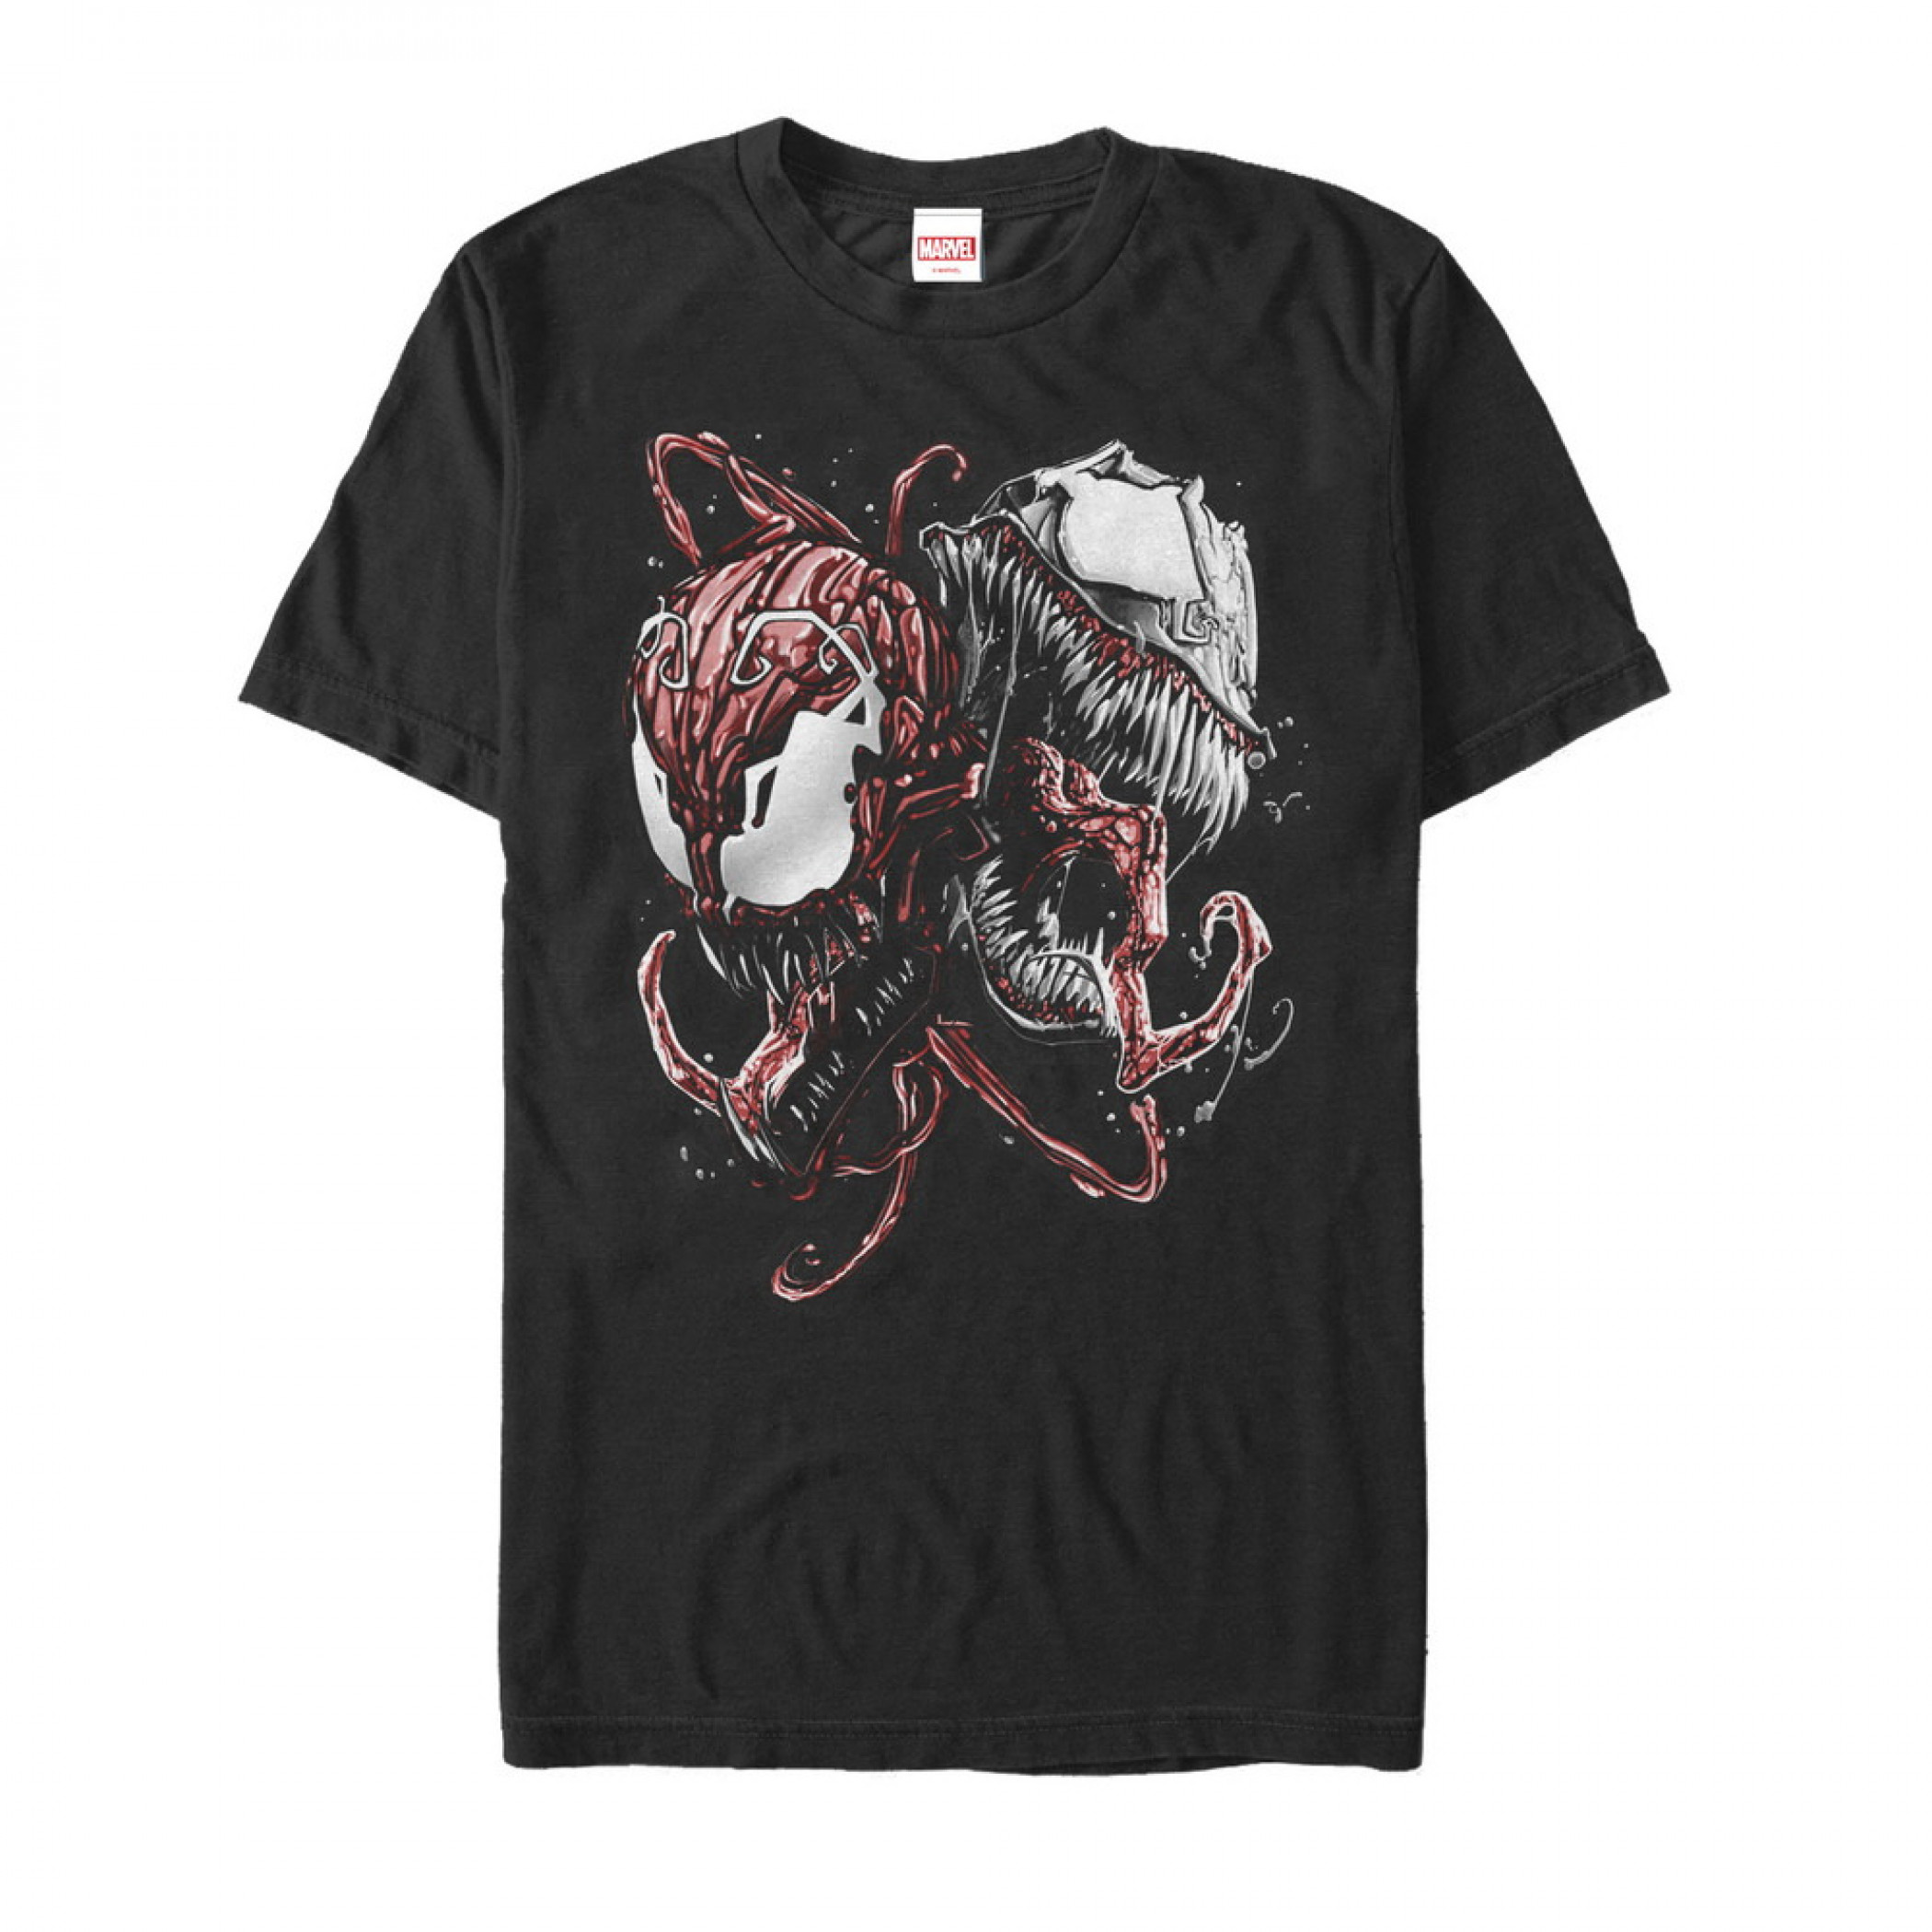 Carnage and Venom Together Forever T-Shirt